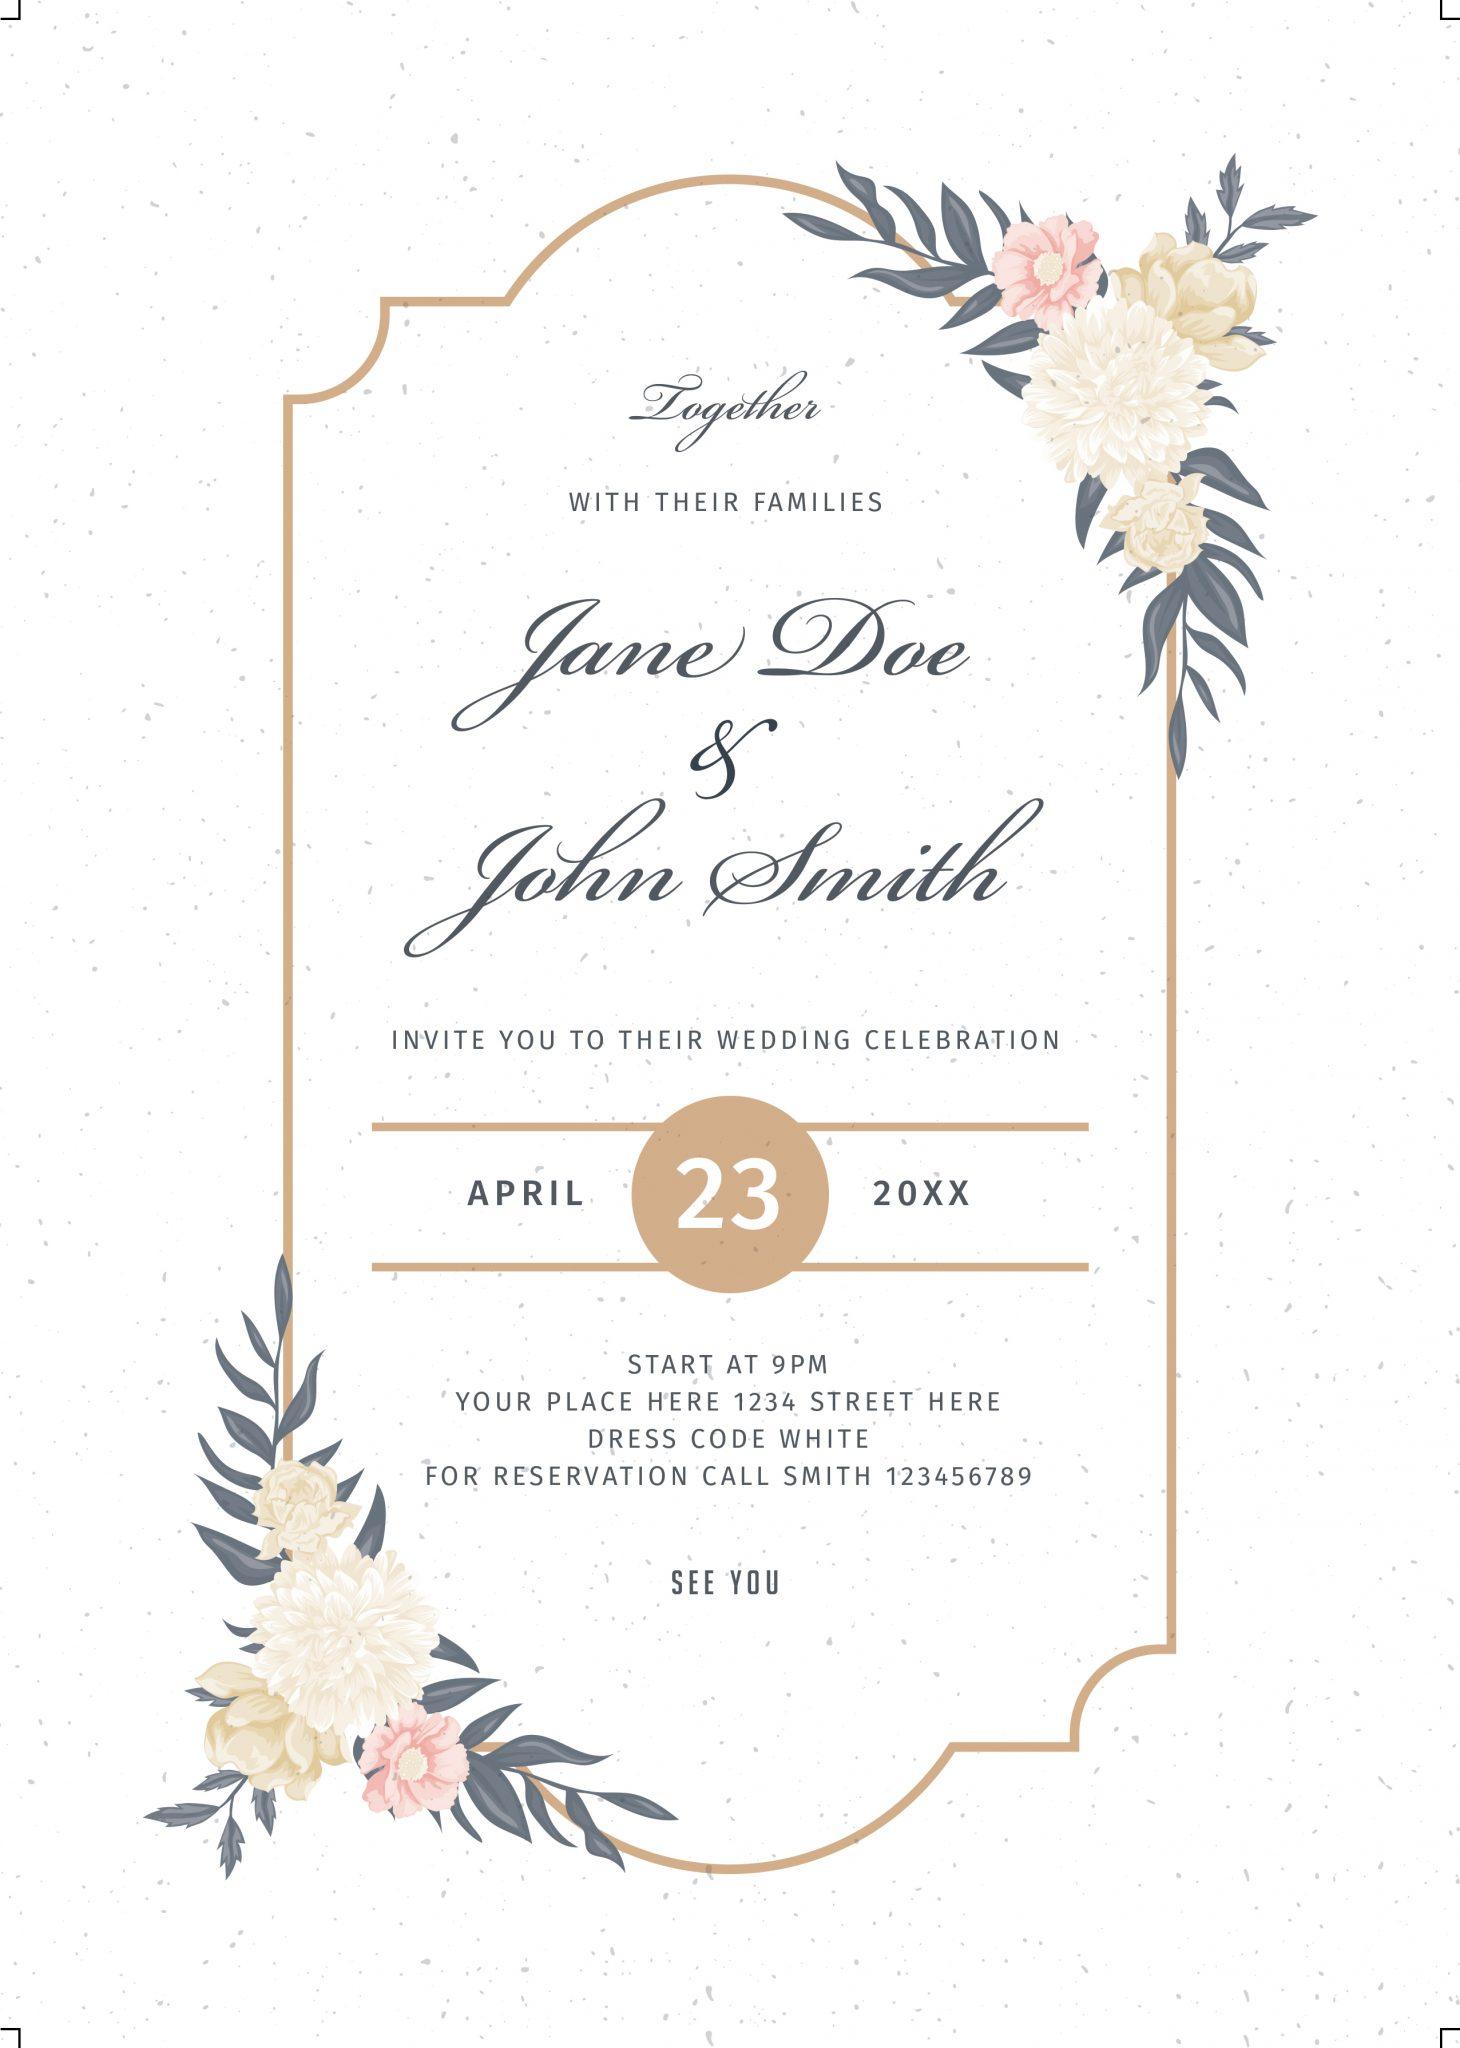 Floral Wedding Invitations.Floralwedding Invitation Bnr Graphics